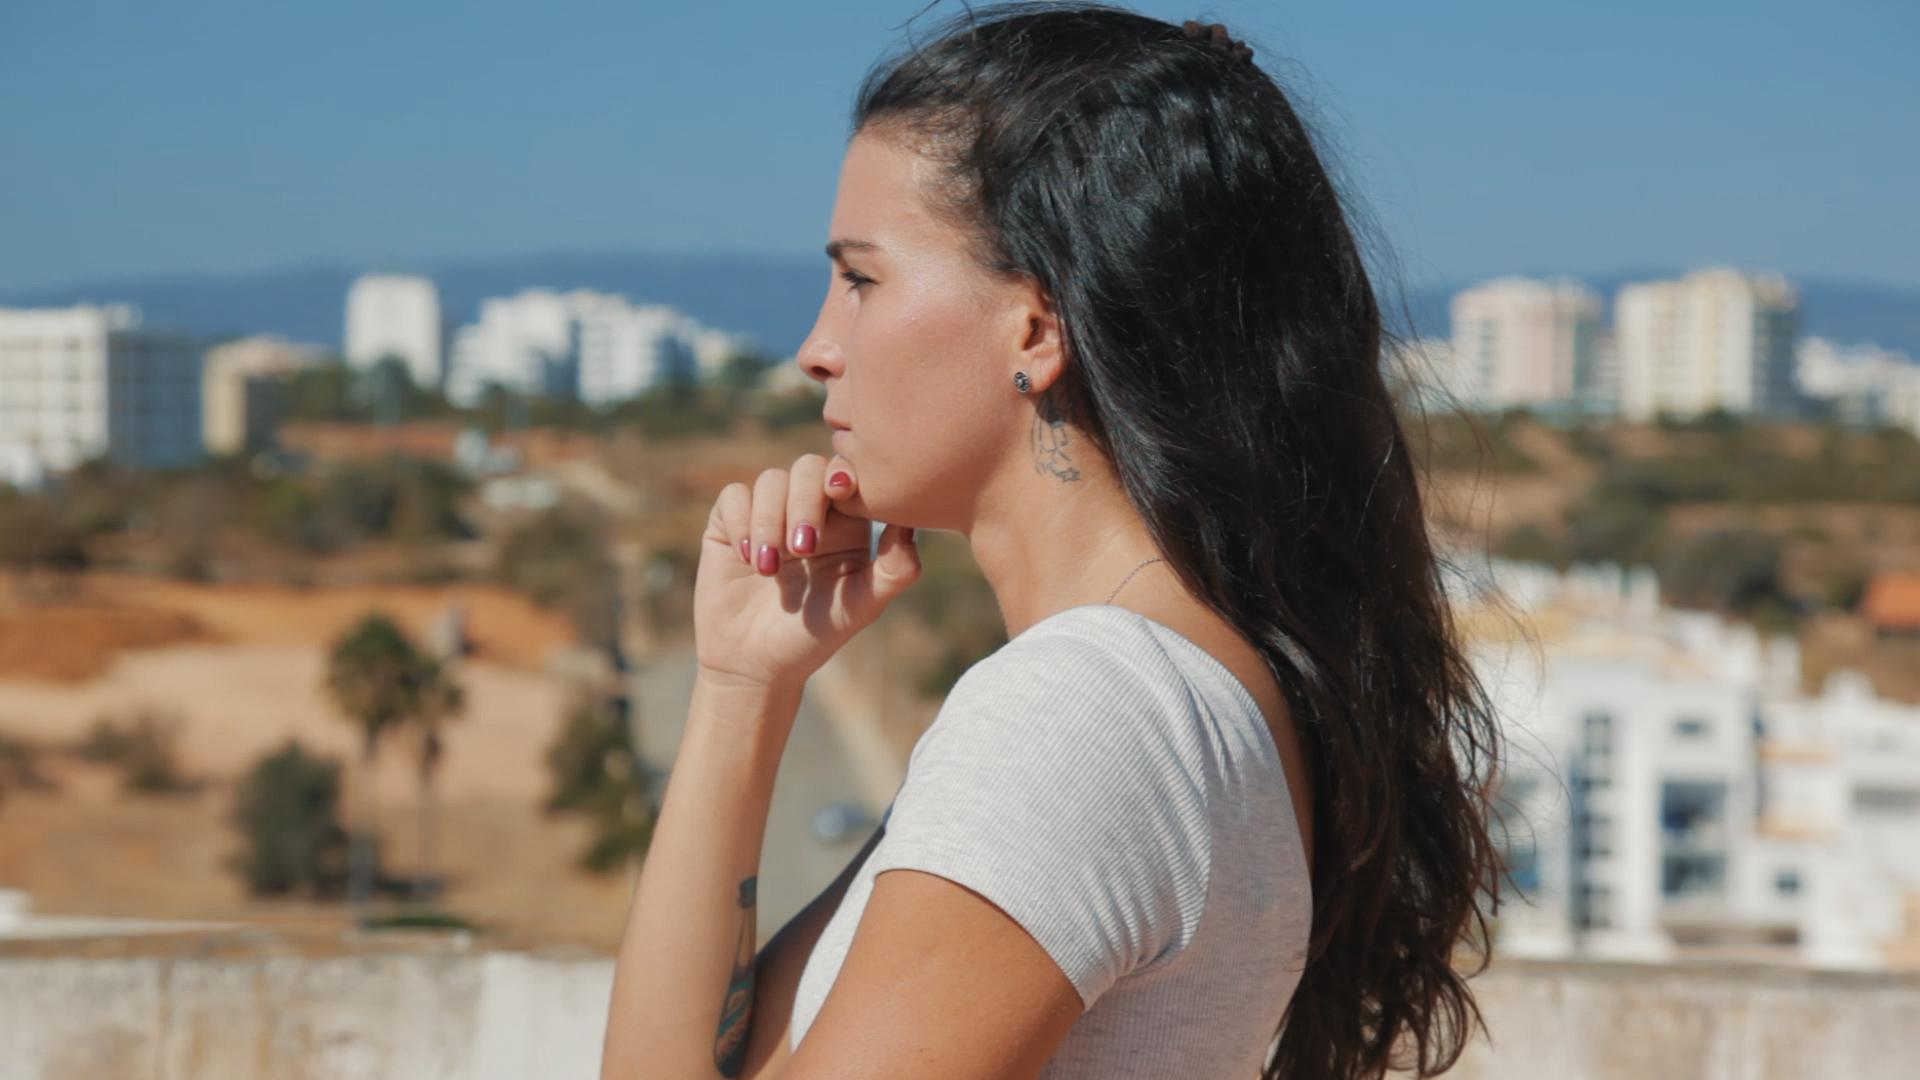 Mariana Rodrigues - Can We Chill (Ne-Yo)